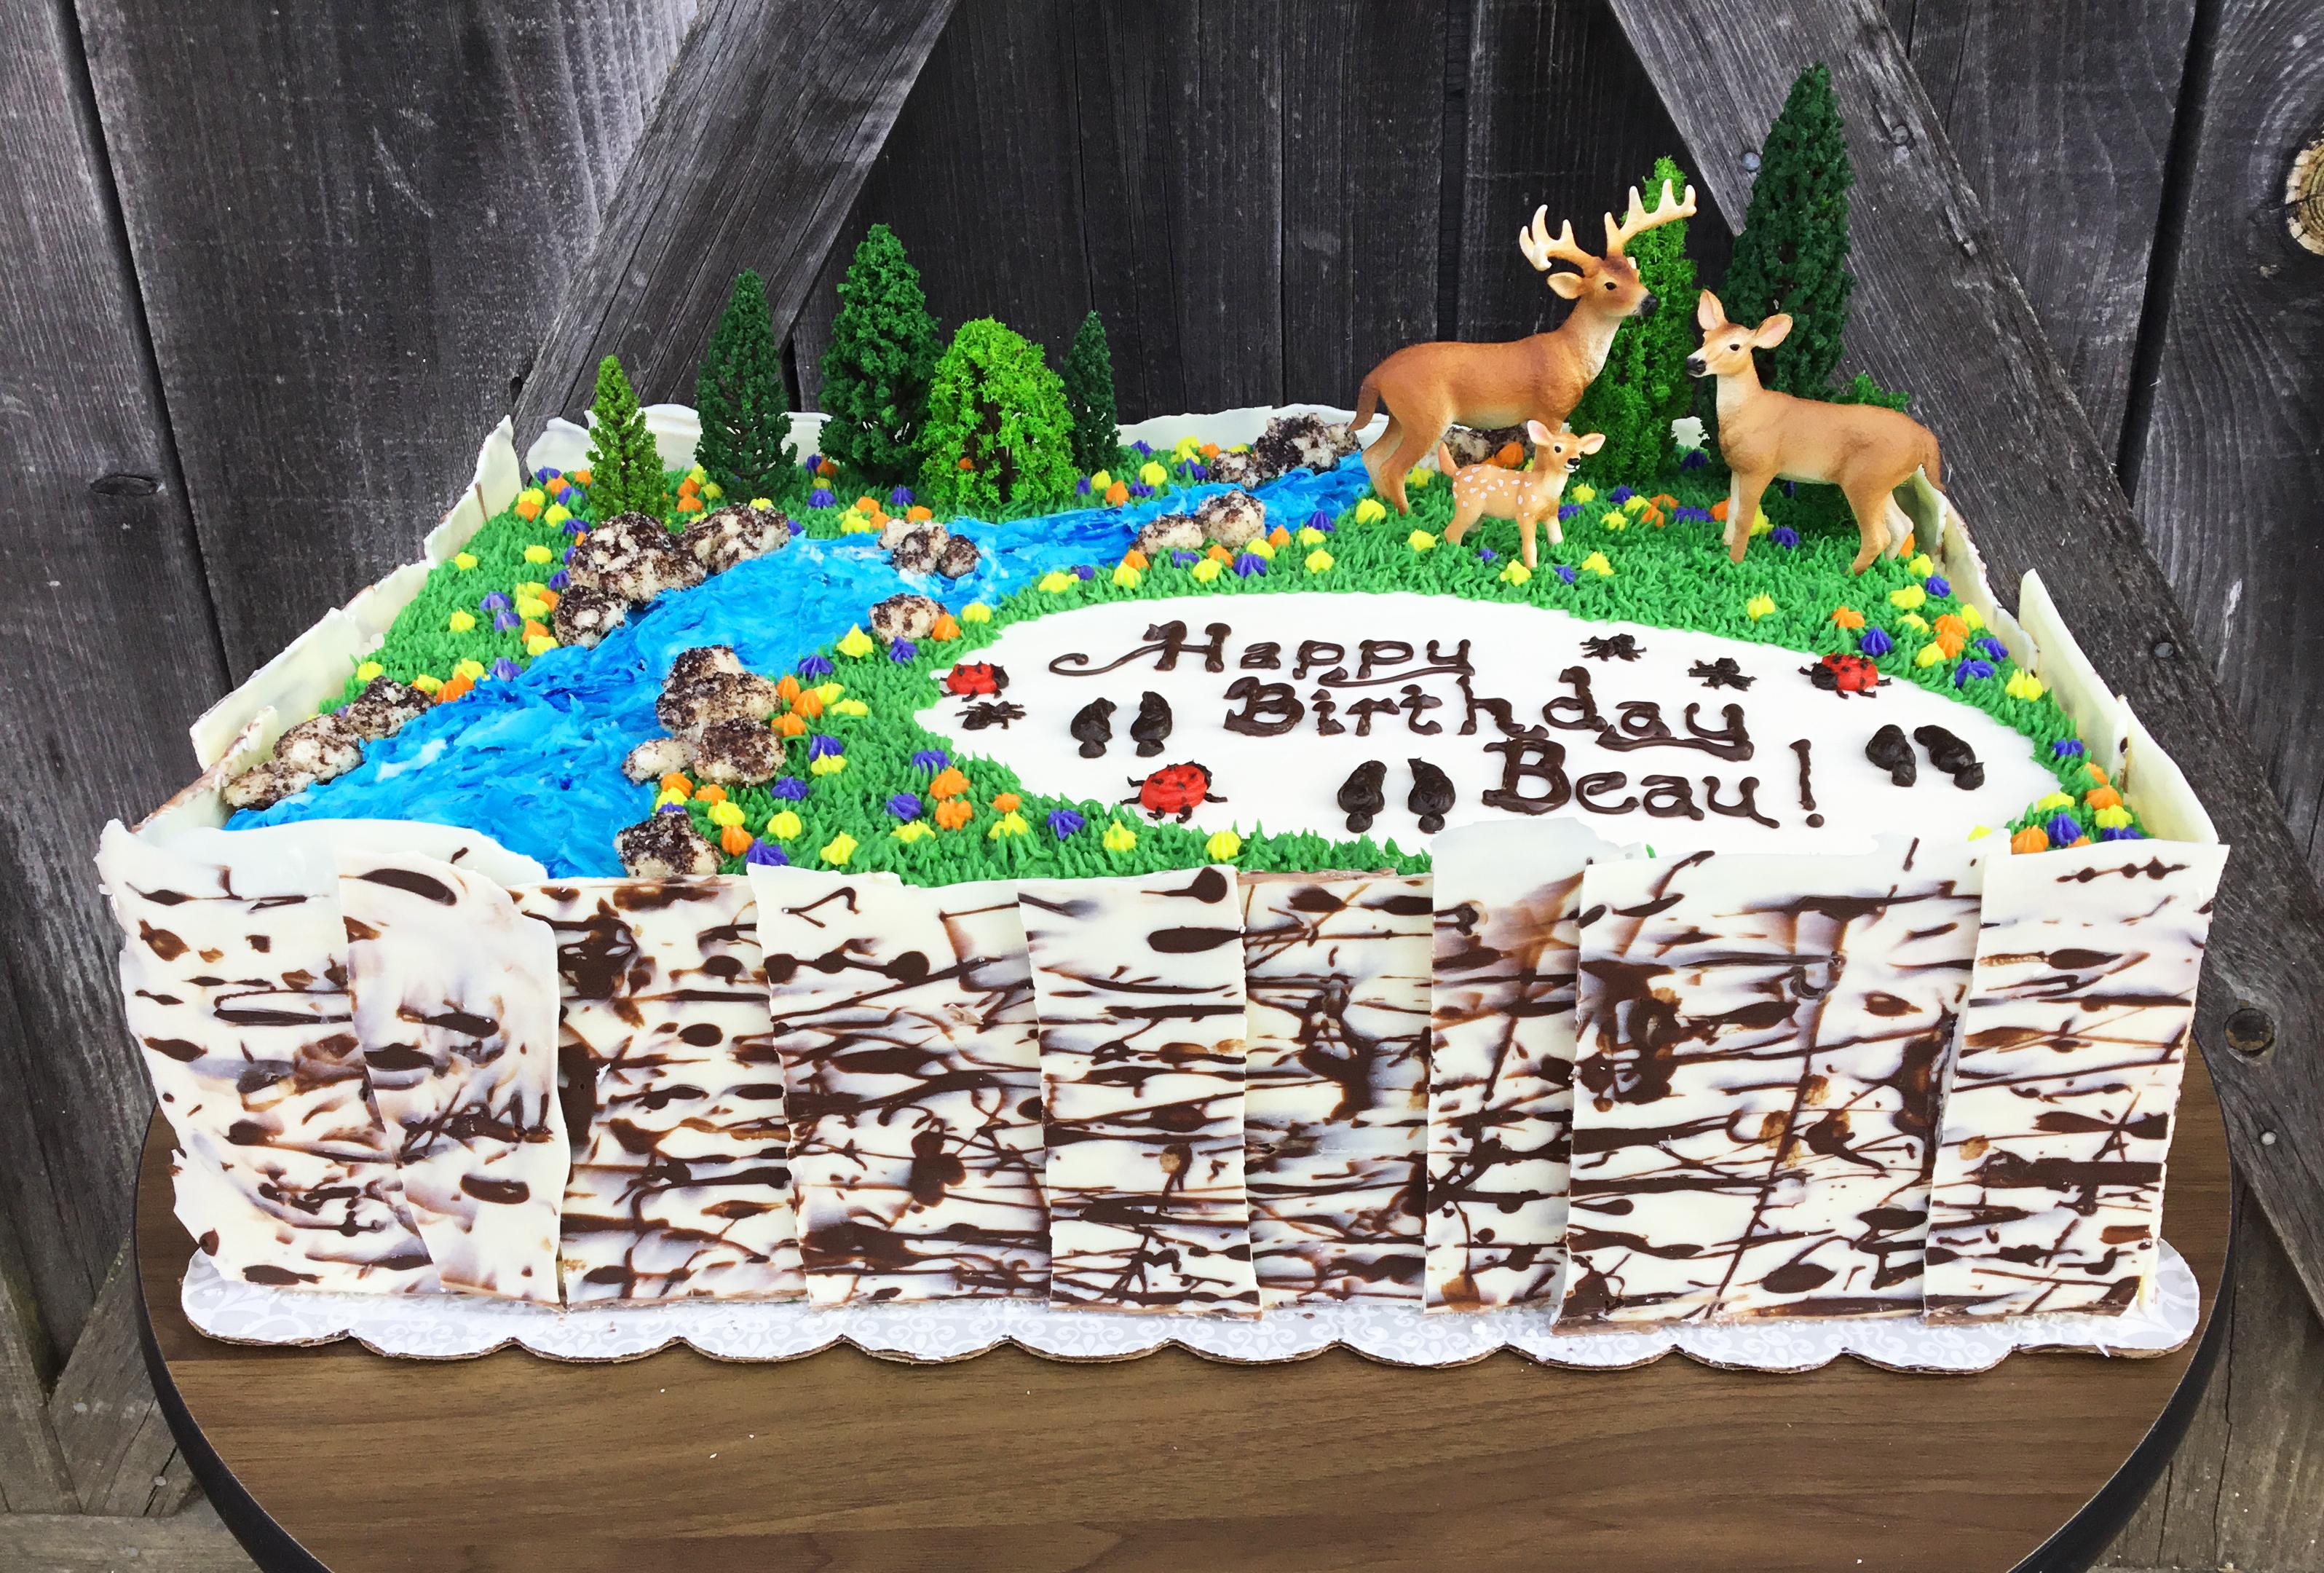 Beau's deer & bug cake